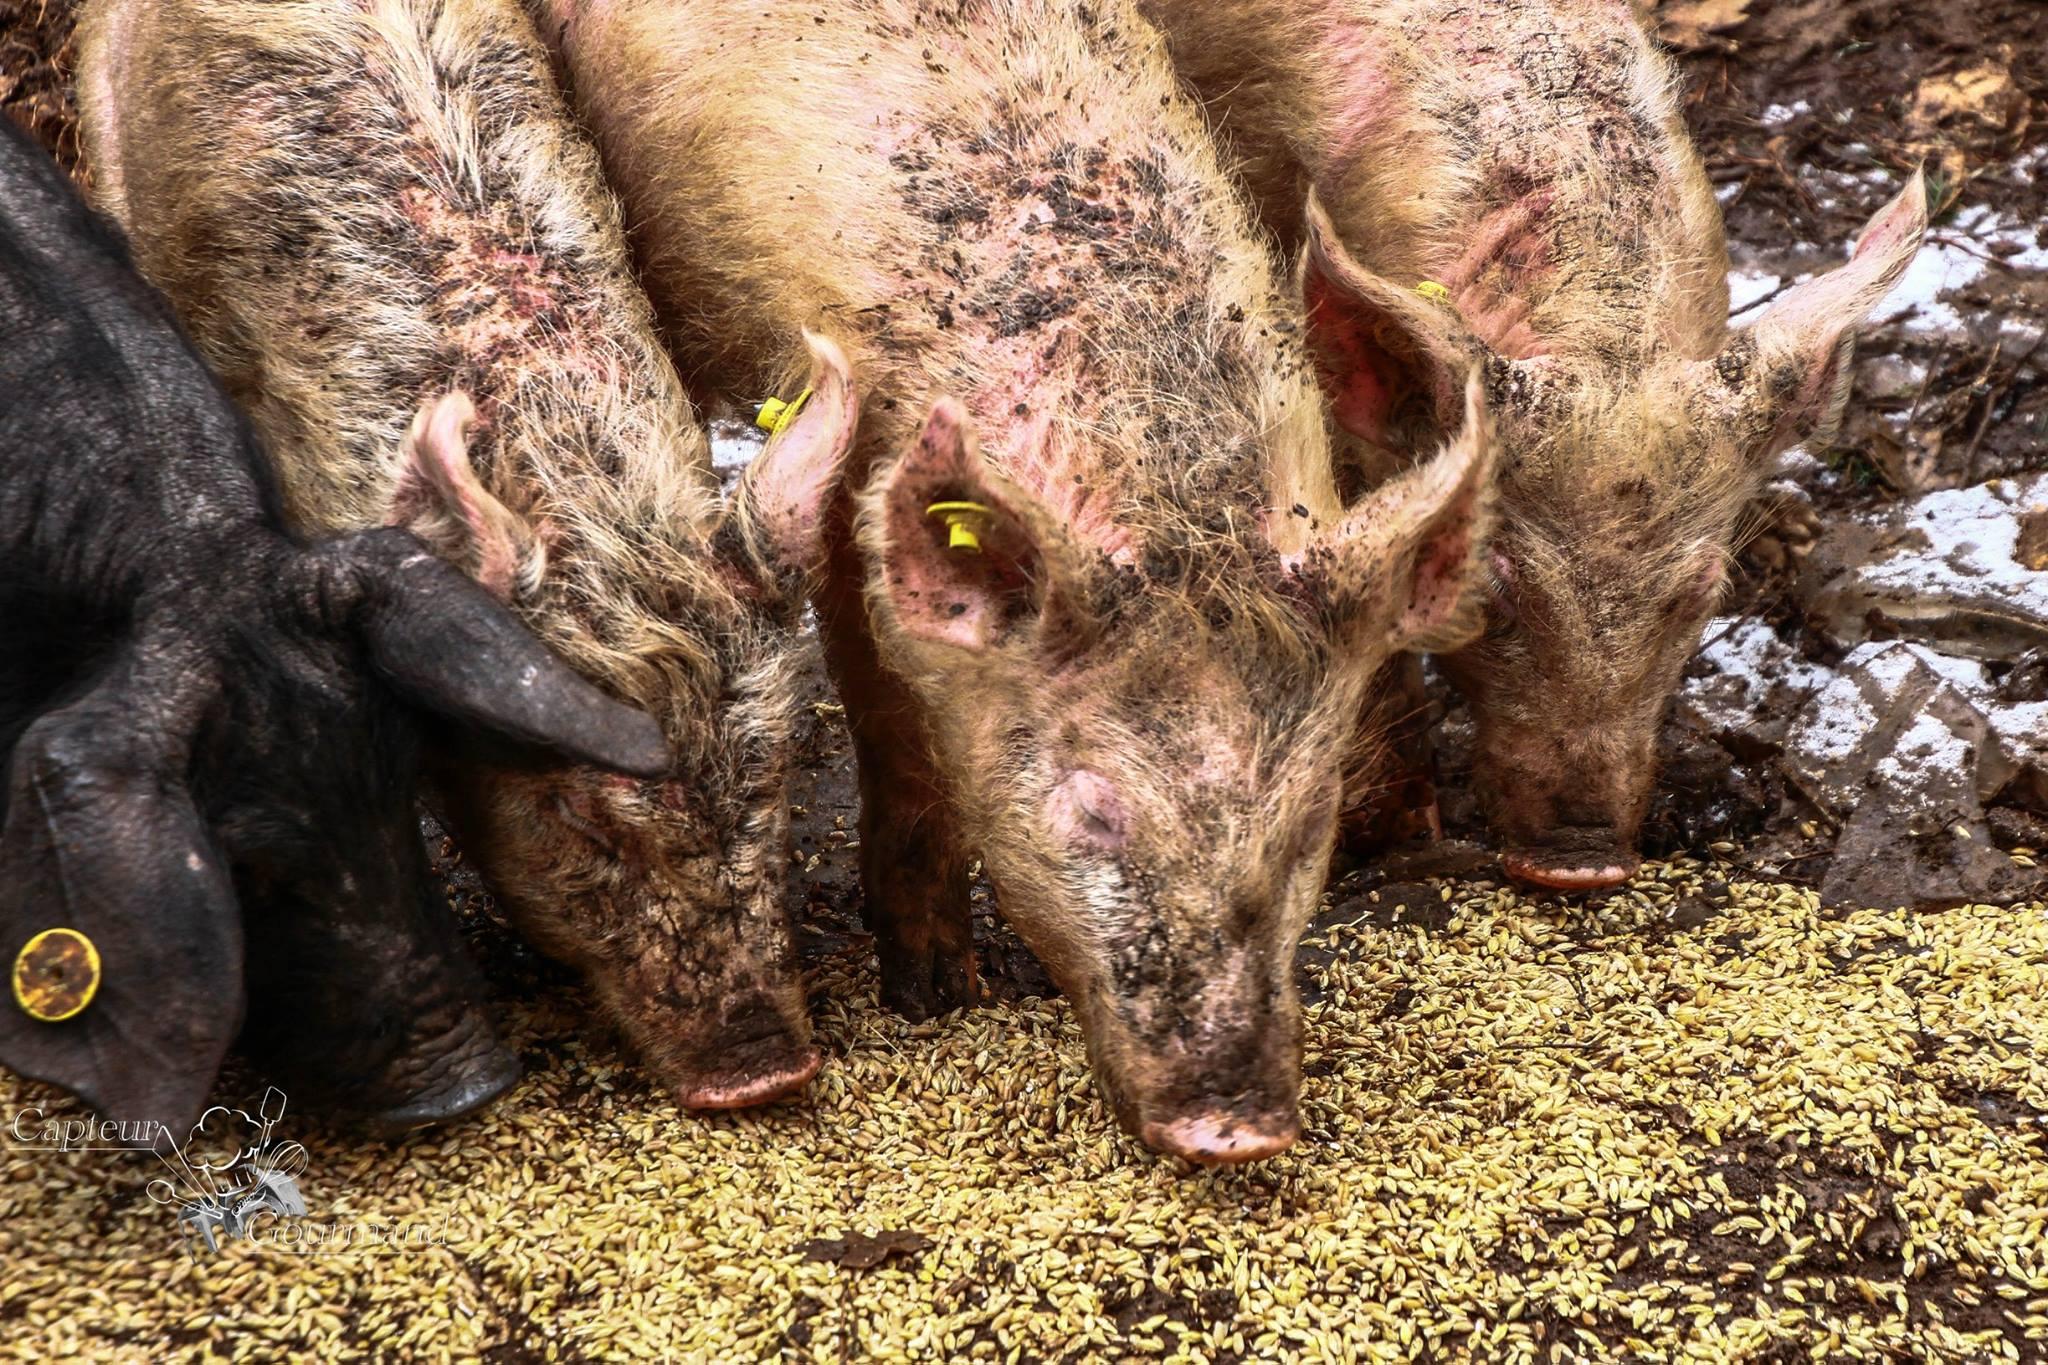 Elevage de porcs Bio. Les Cochons de la Cote d'Azur (7).jpg